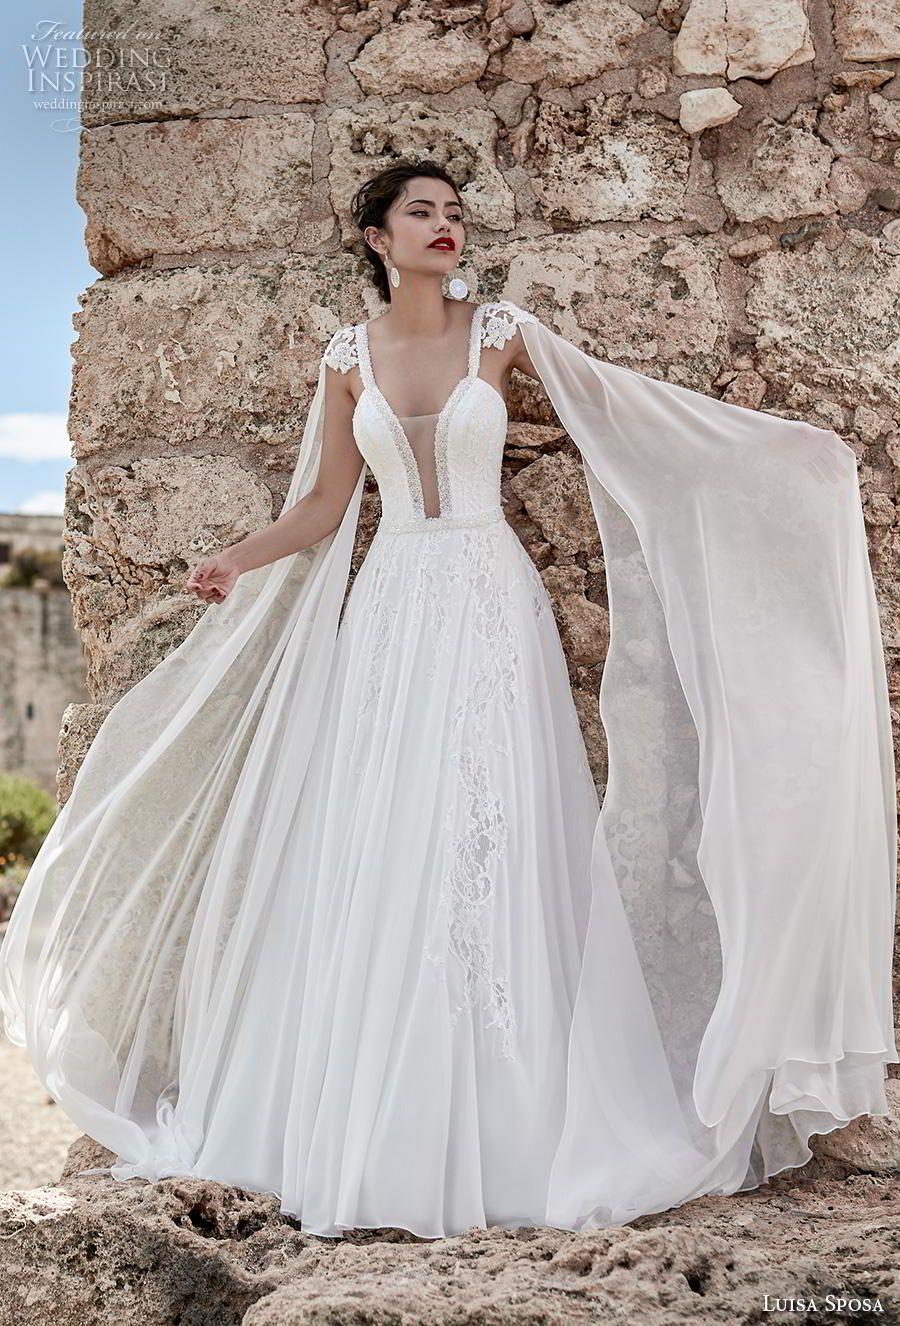 Luisa Sposa 2020 Wedding Dresses Wedding Inspirasi Grecian Wedding Dress Goddess Wedding Dress Wedding Dresses [ 1326 x 900 Pixel ]